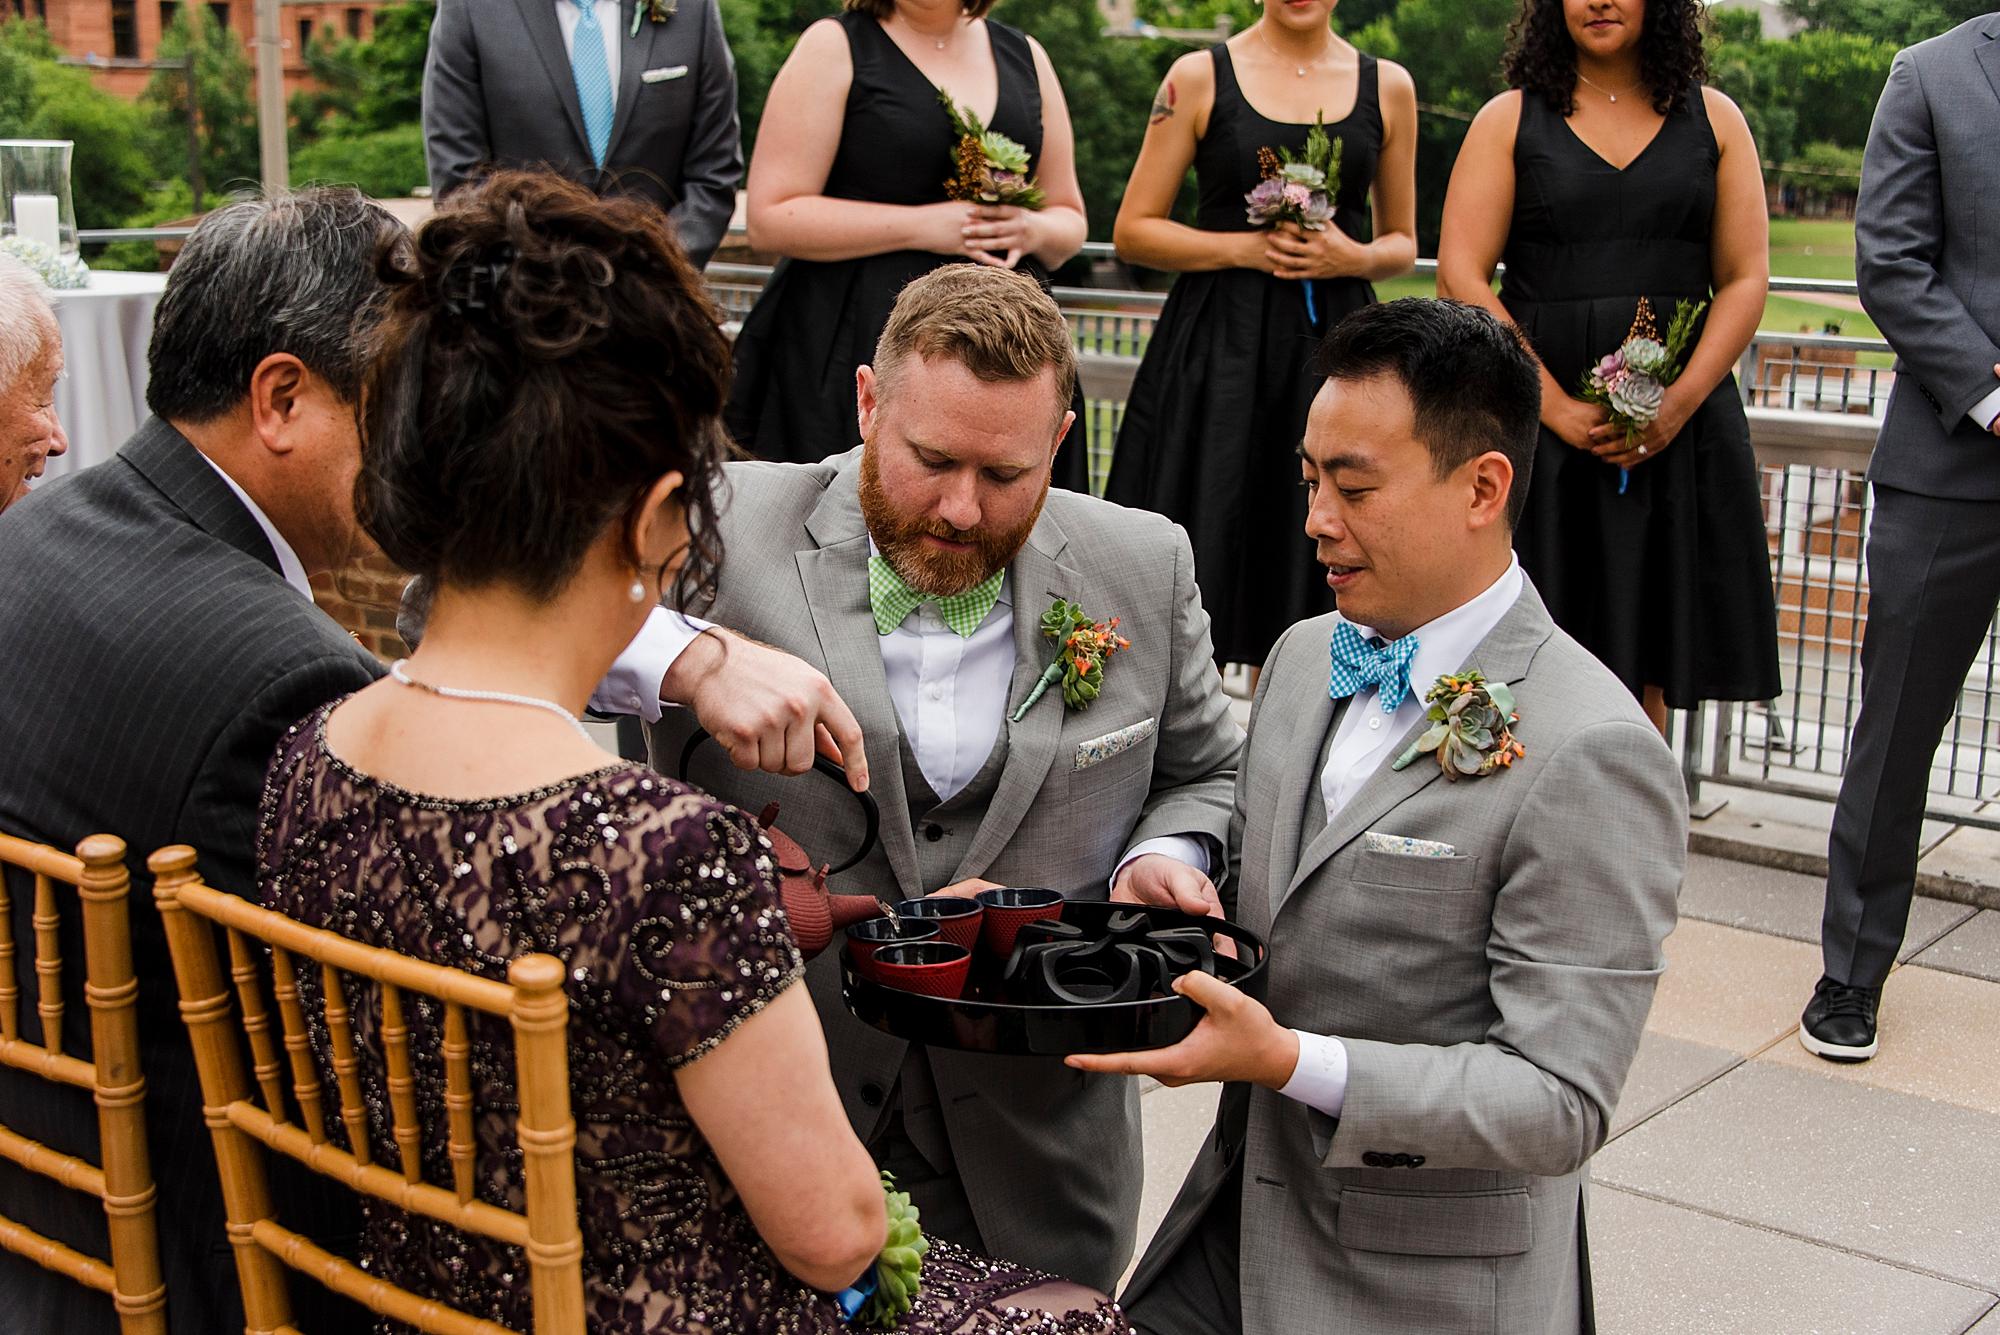 Dan_and_Byron_Love_by_Joe_Mac_Philadelphia_Wedding_LGBTQ_Photography_Gay_Independence_visitor_Center_91.JPG